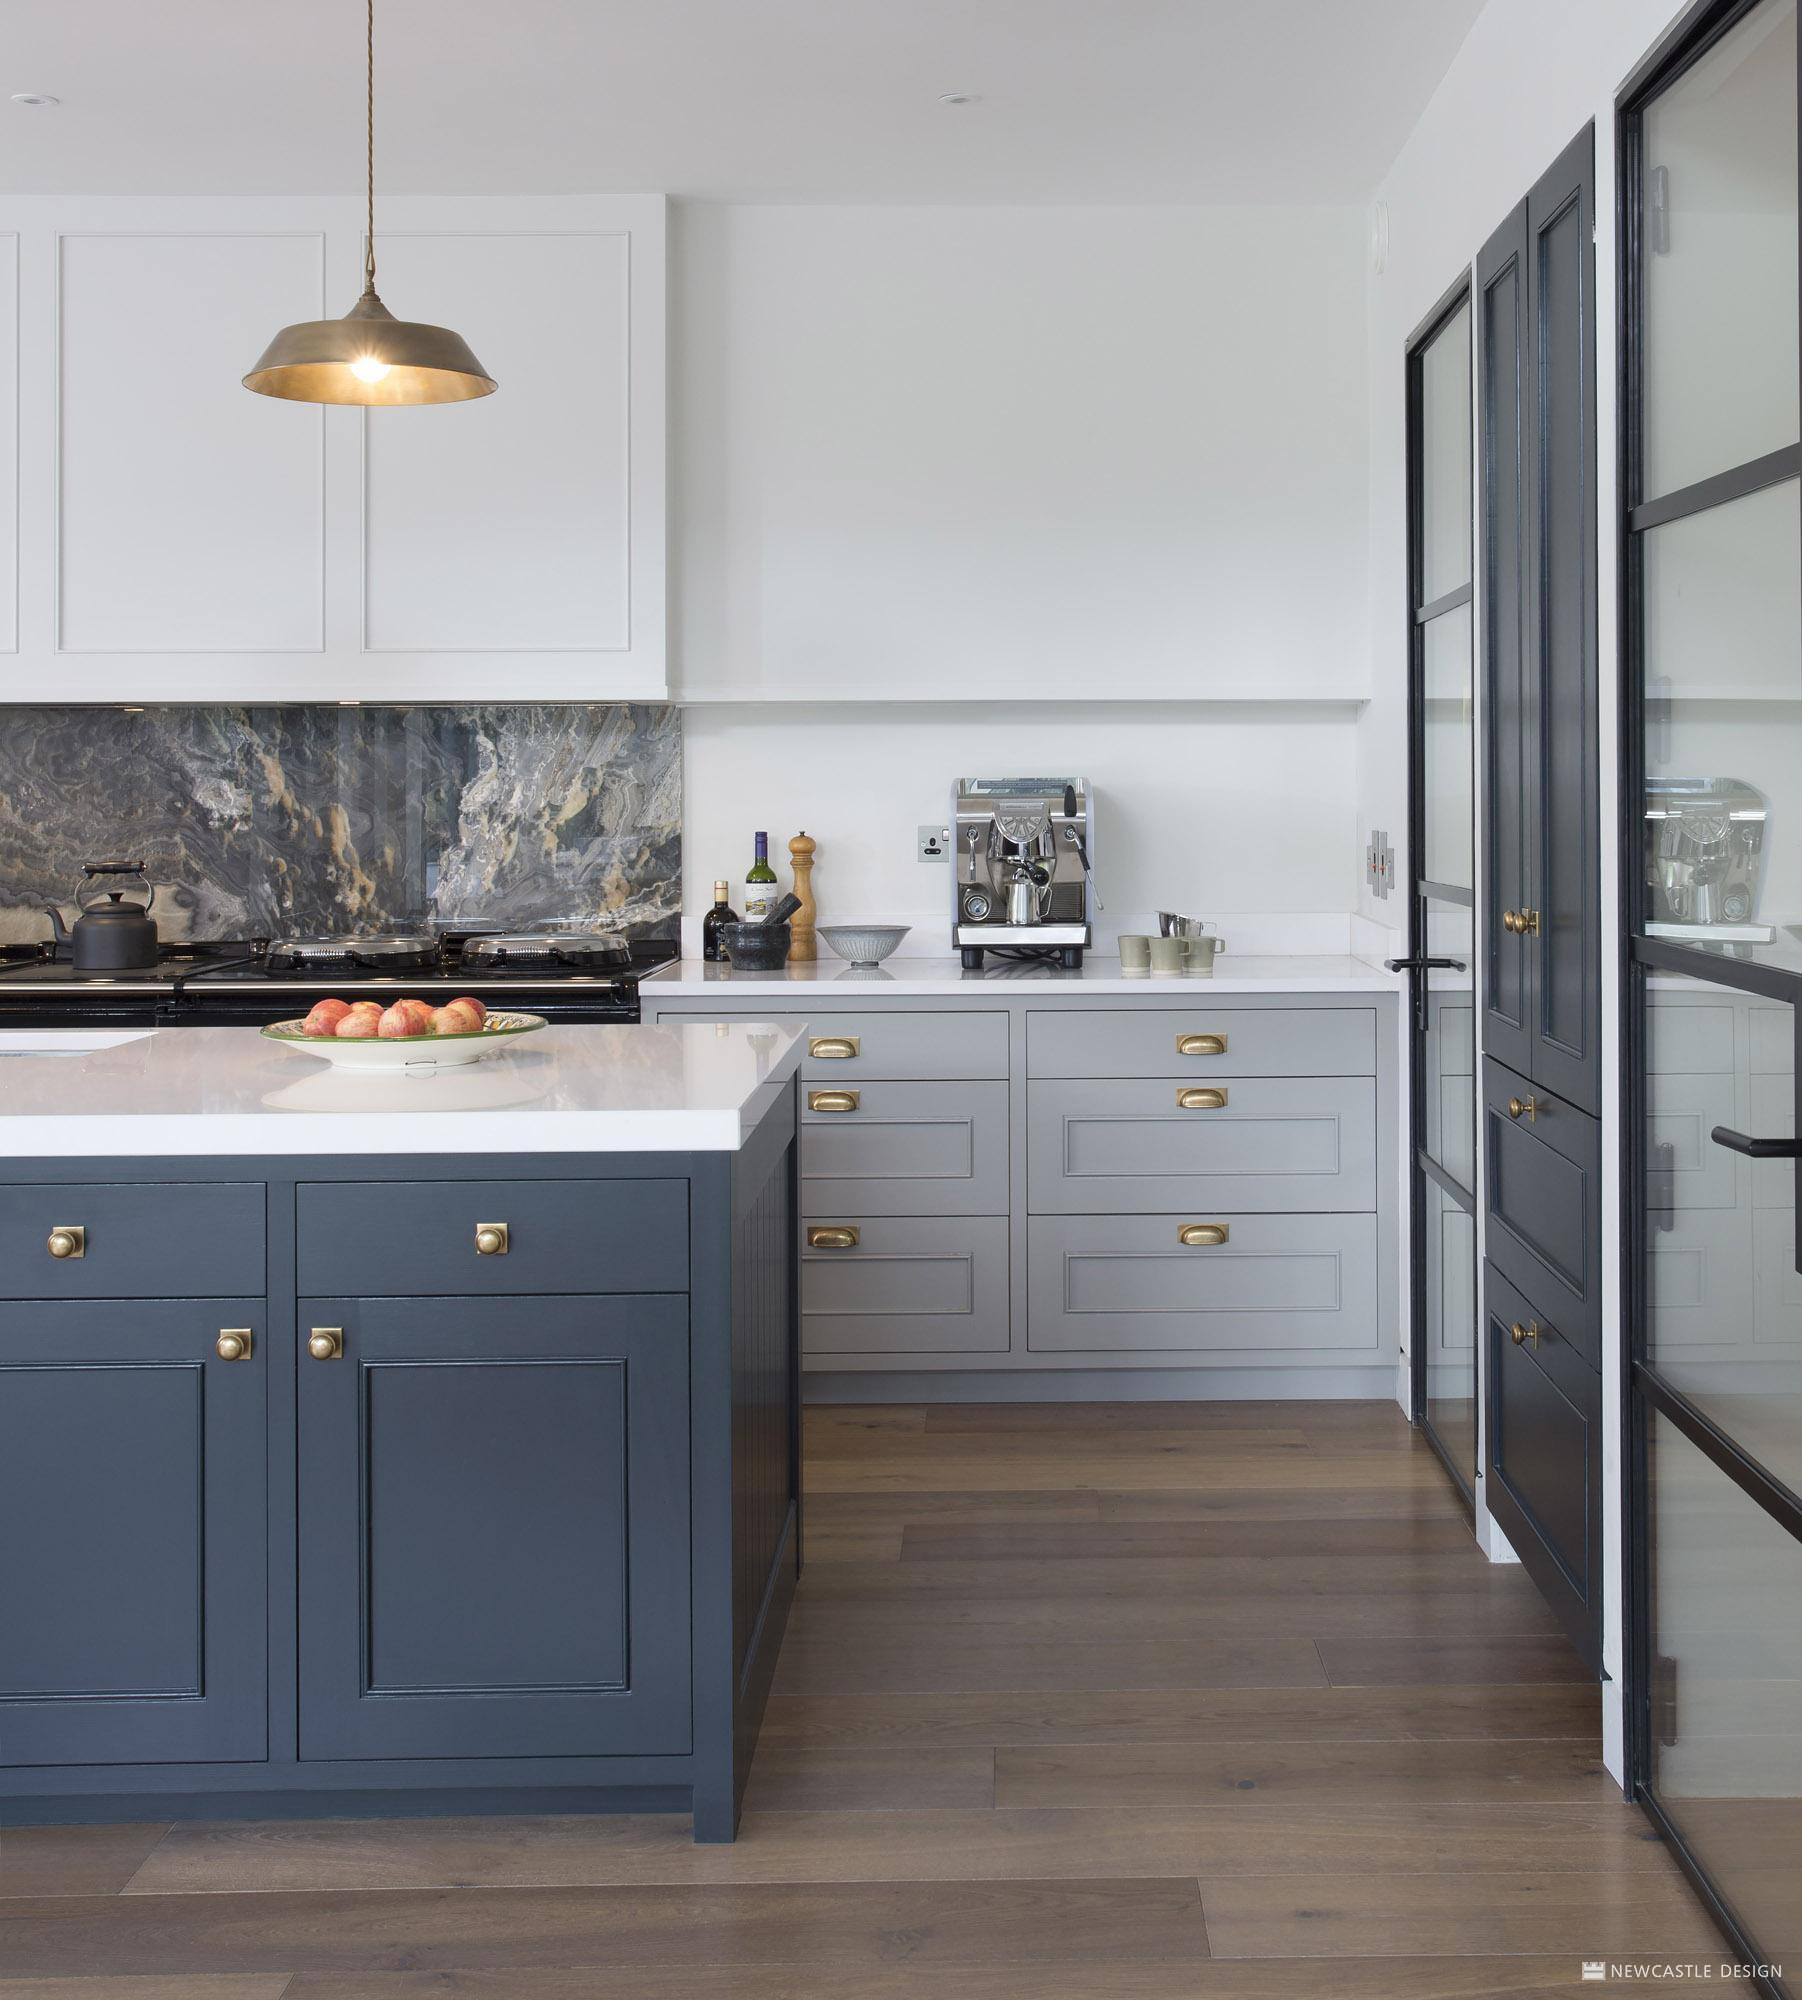 The Marylebone Kitchen